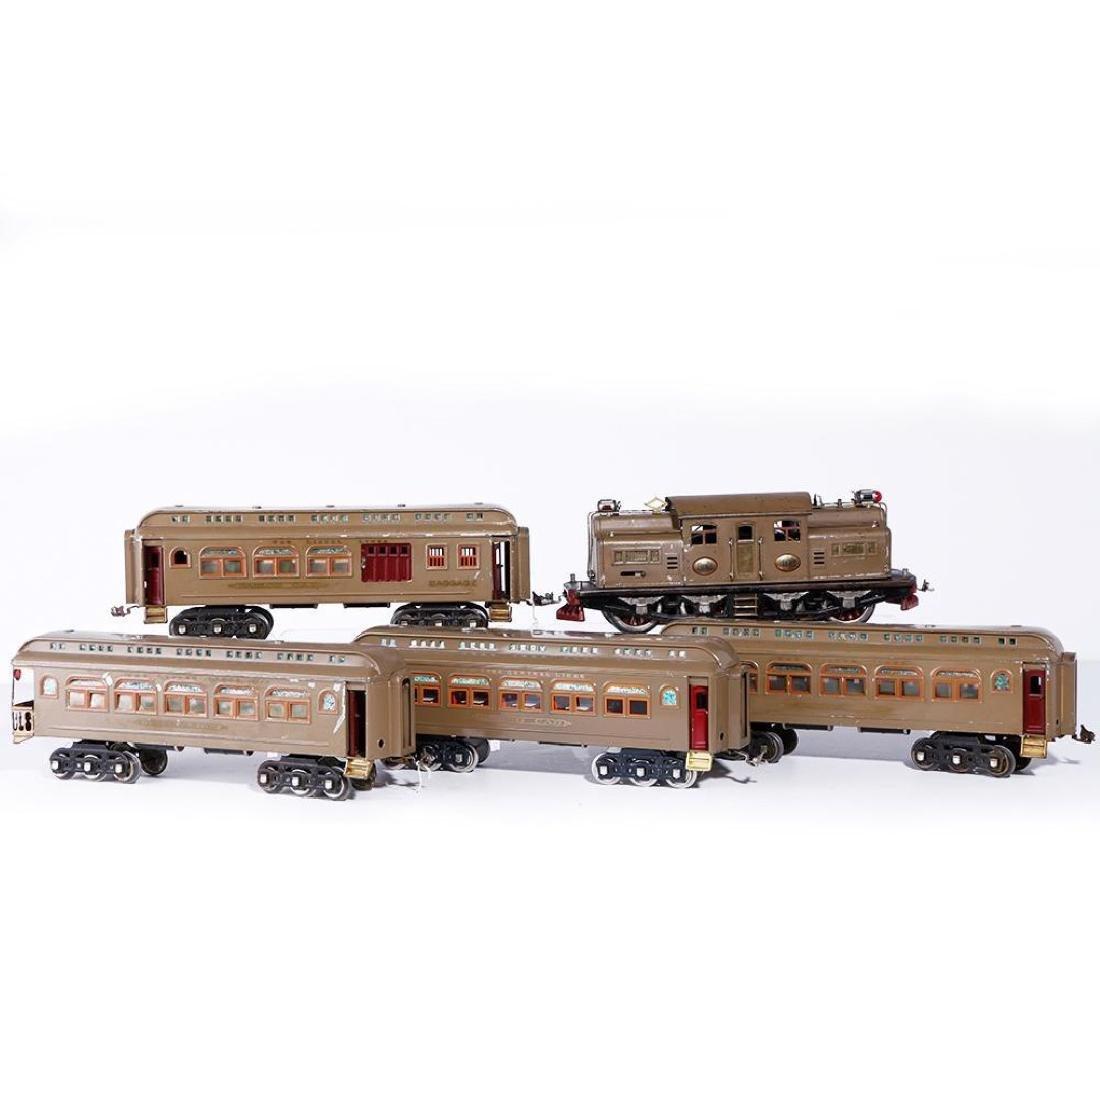 Lionel 402 Standard Gauge PassengerSet with Repro Diner